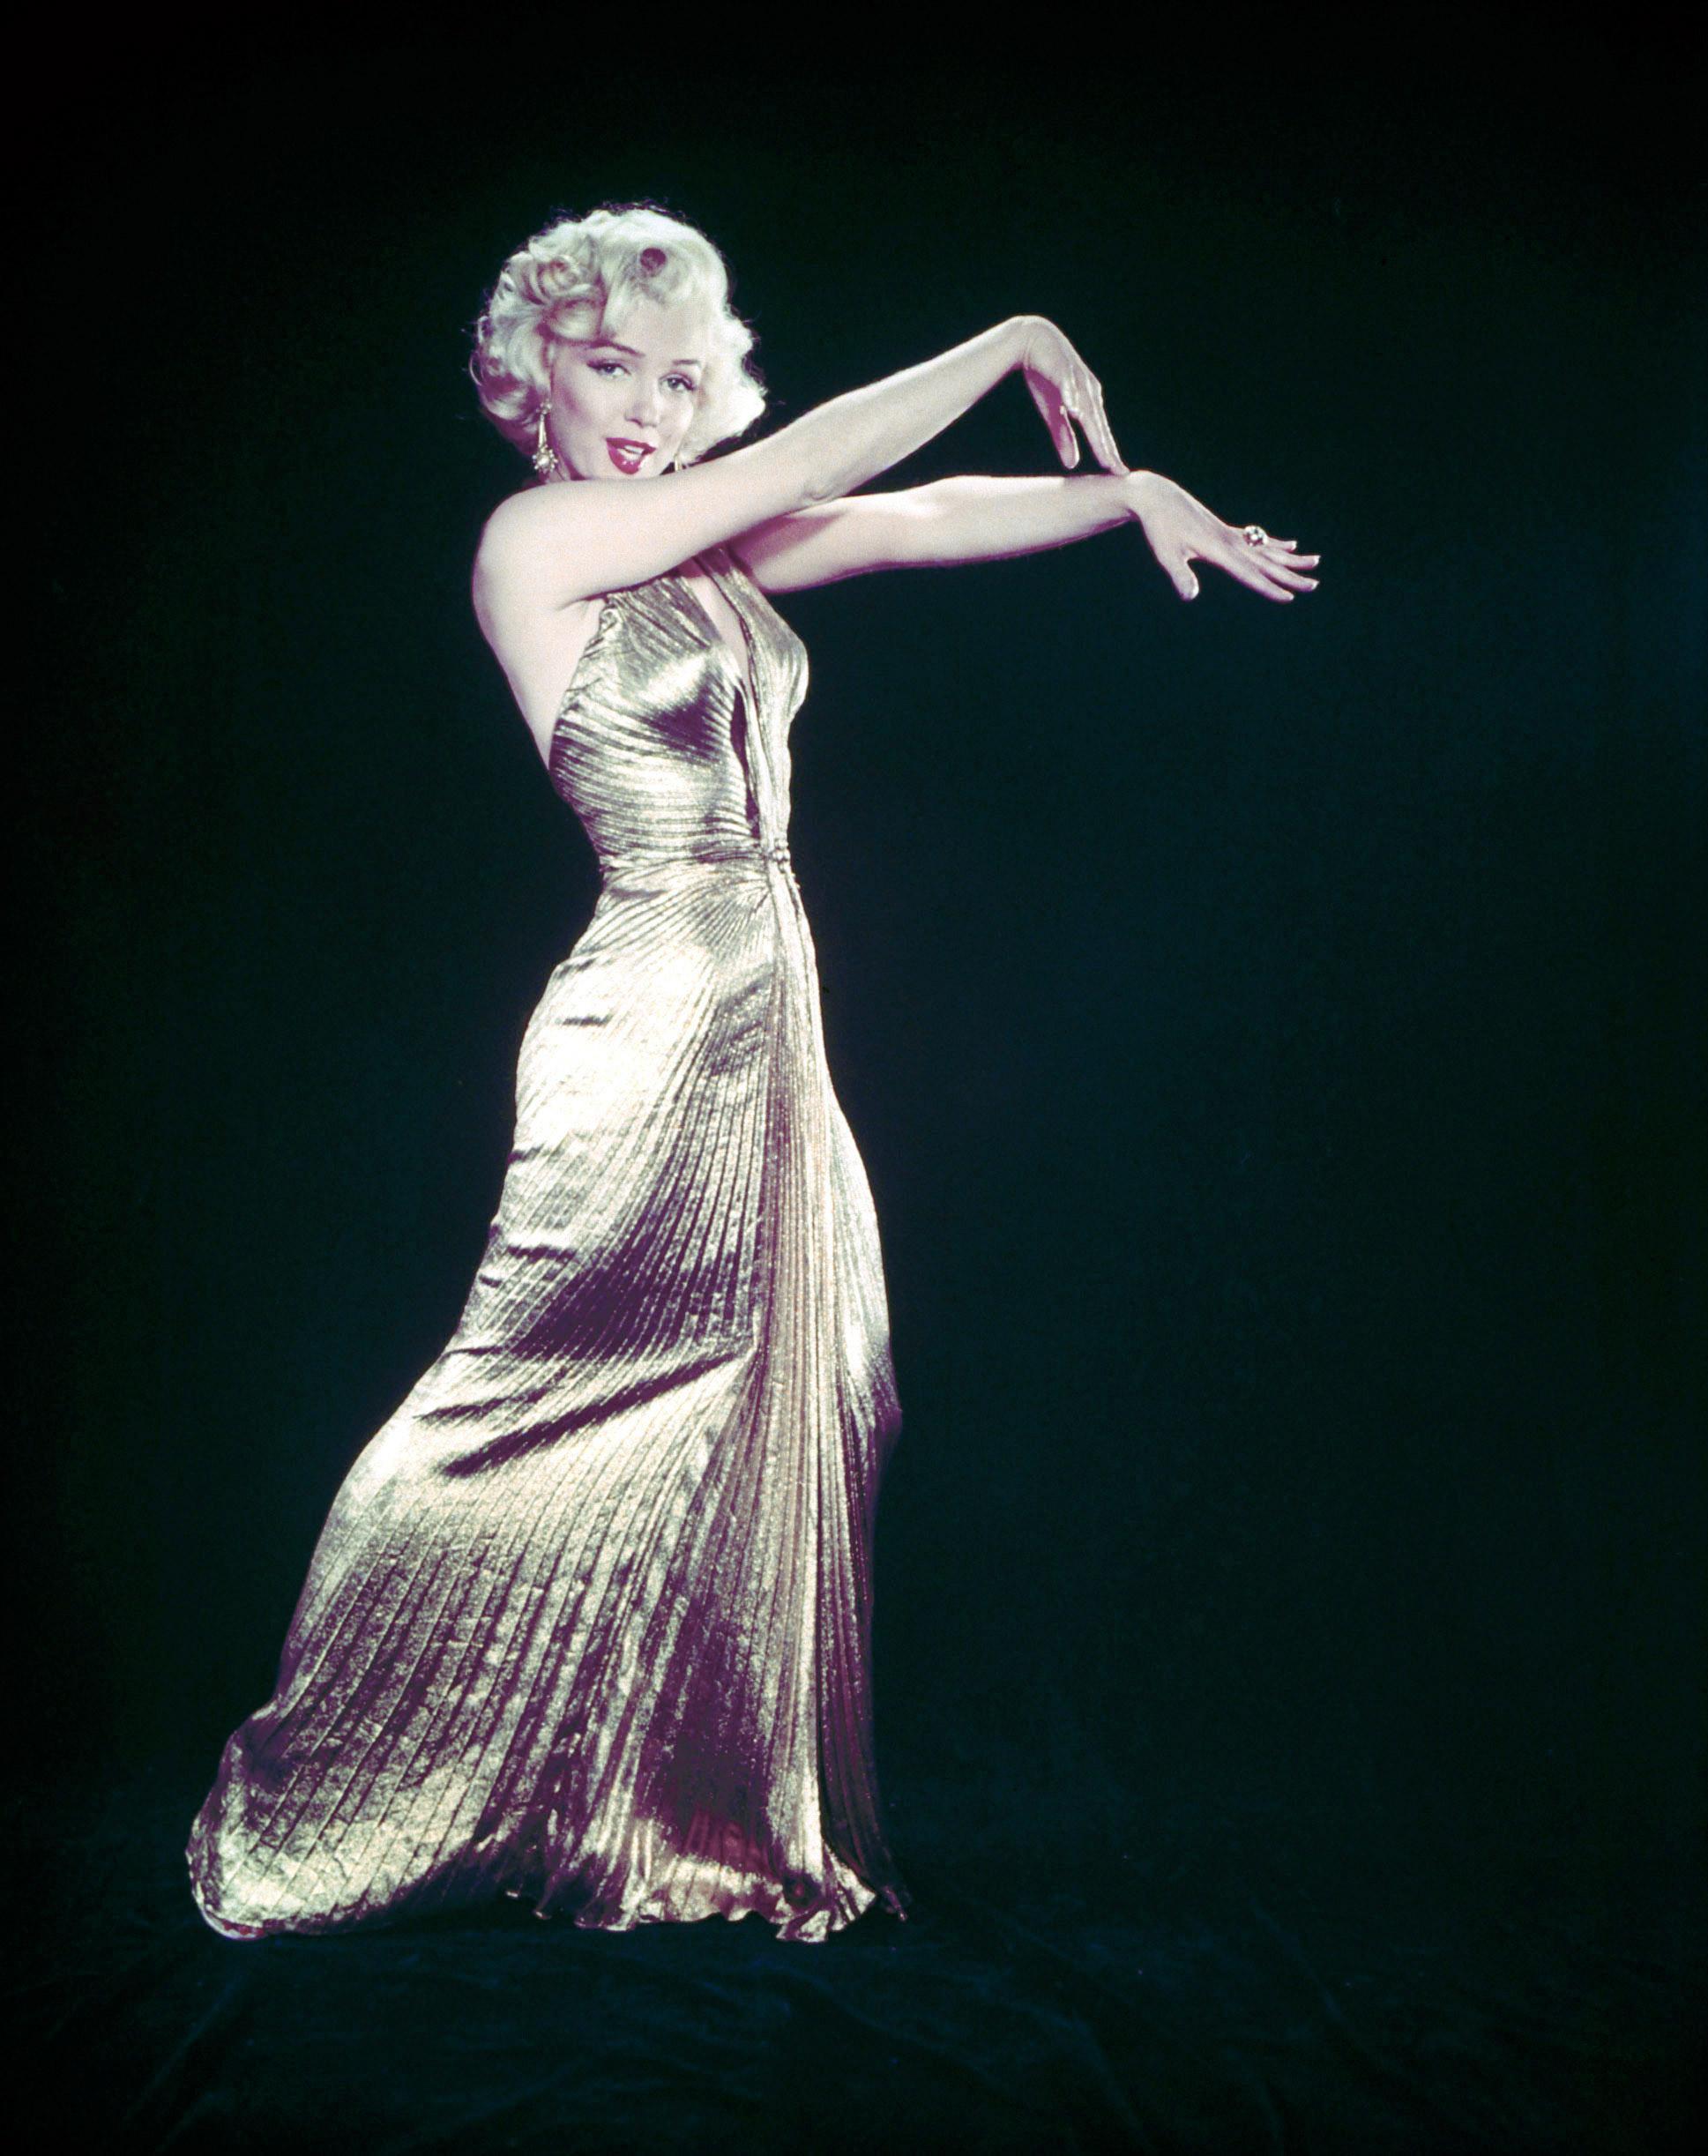 "Set aside the white halter dress in favor of Marilyn Monroe's gold lamé gown from the 1953 film""Gentlemen Prefer Blondes."""